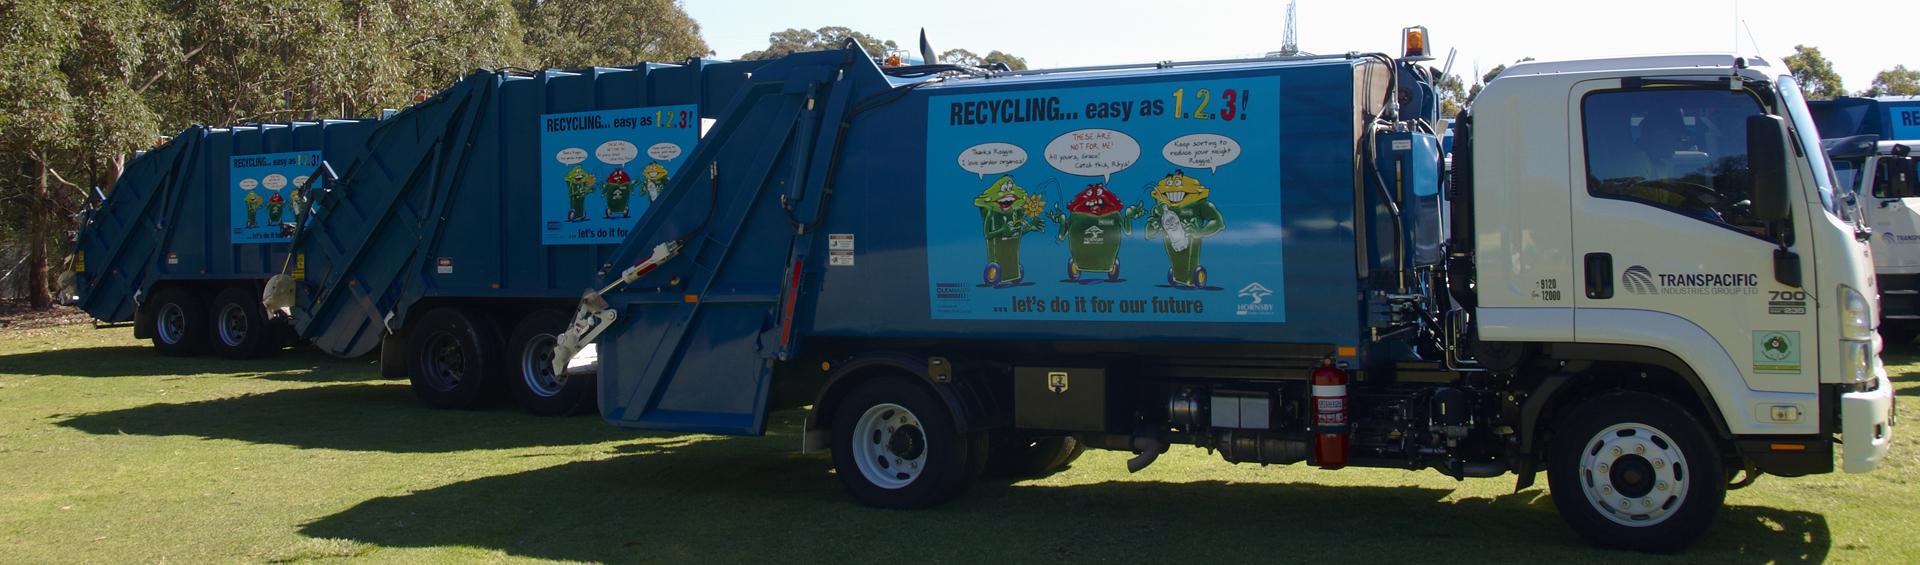 Waste-trucks2.jpg